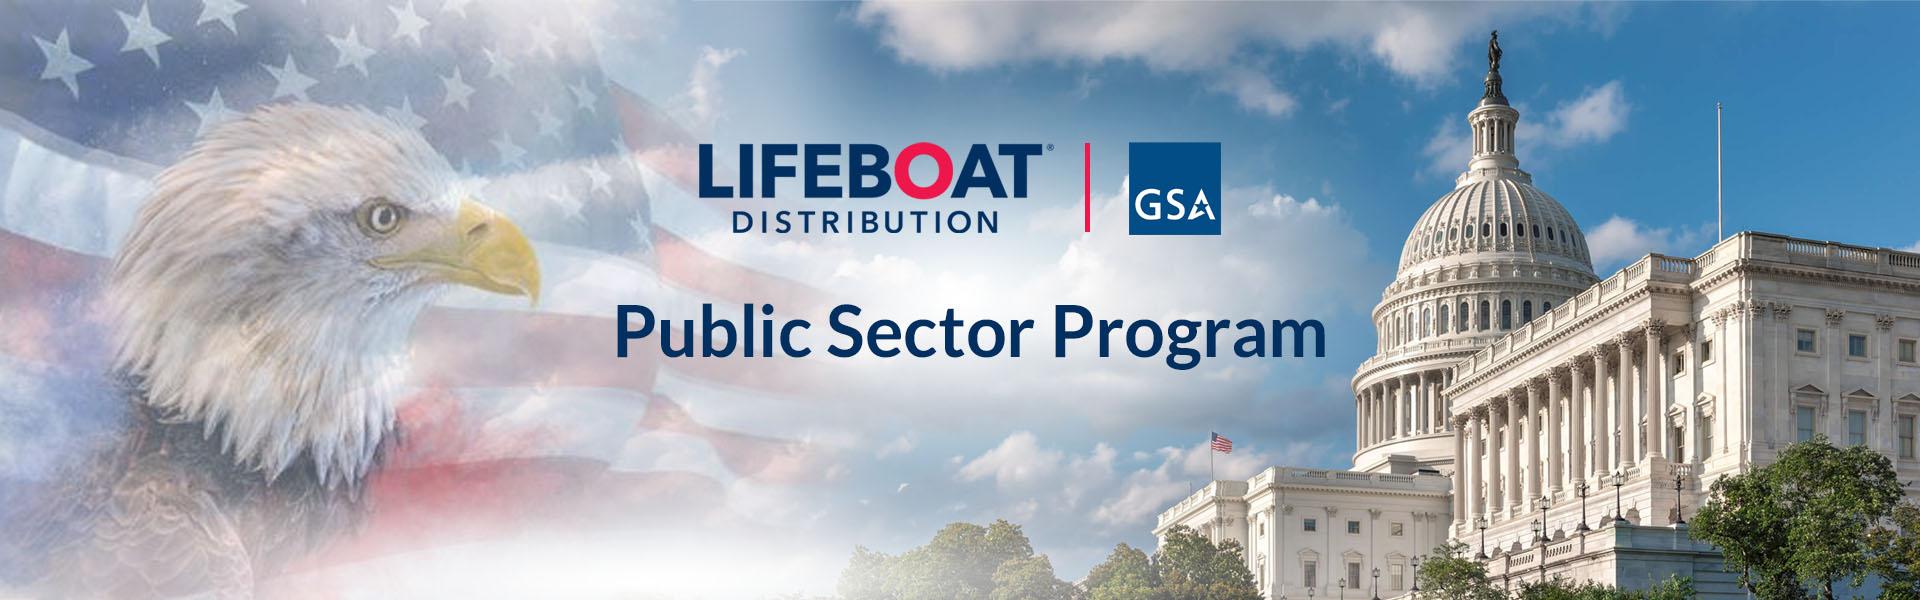 Lifeboat Distribution - Home